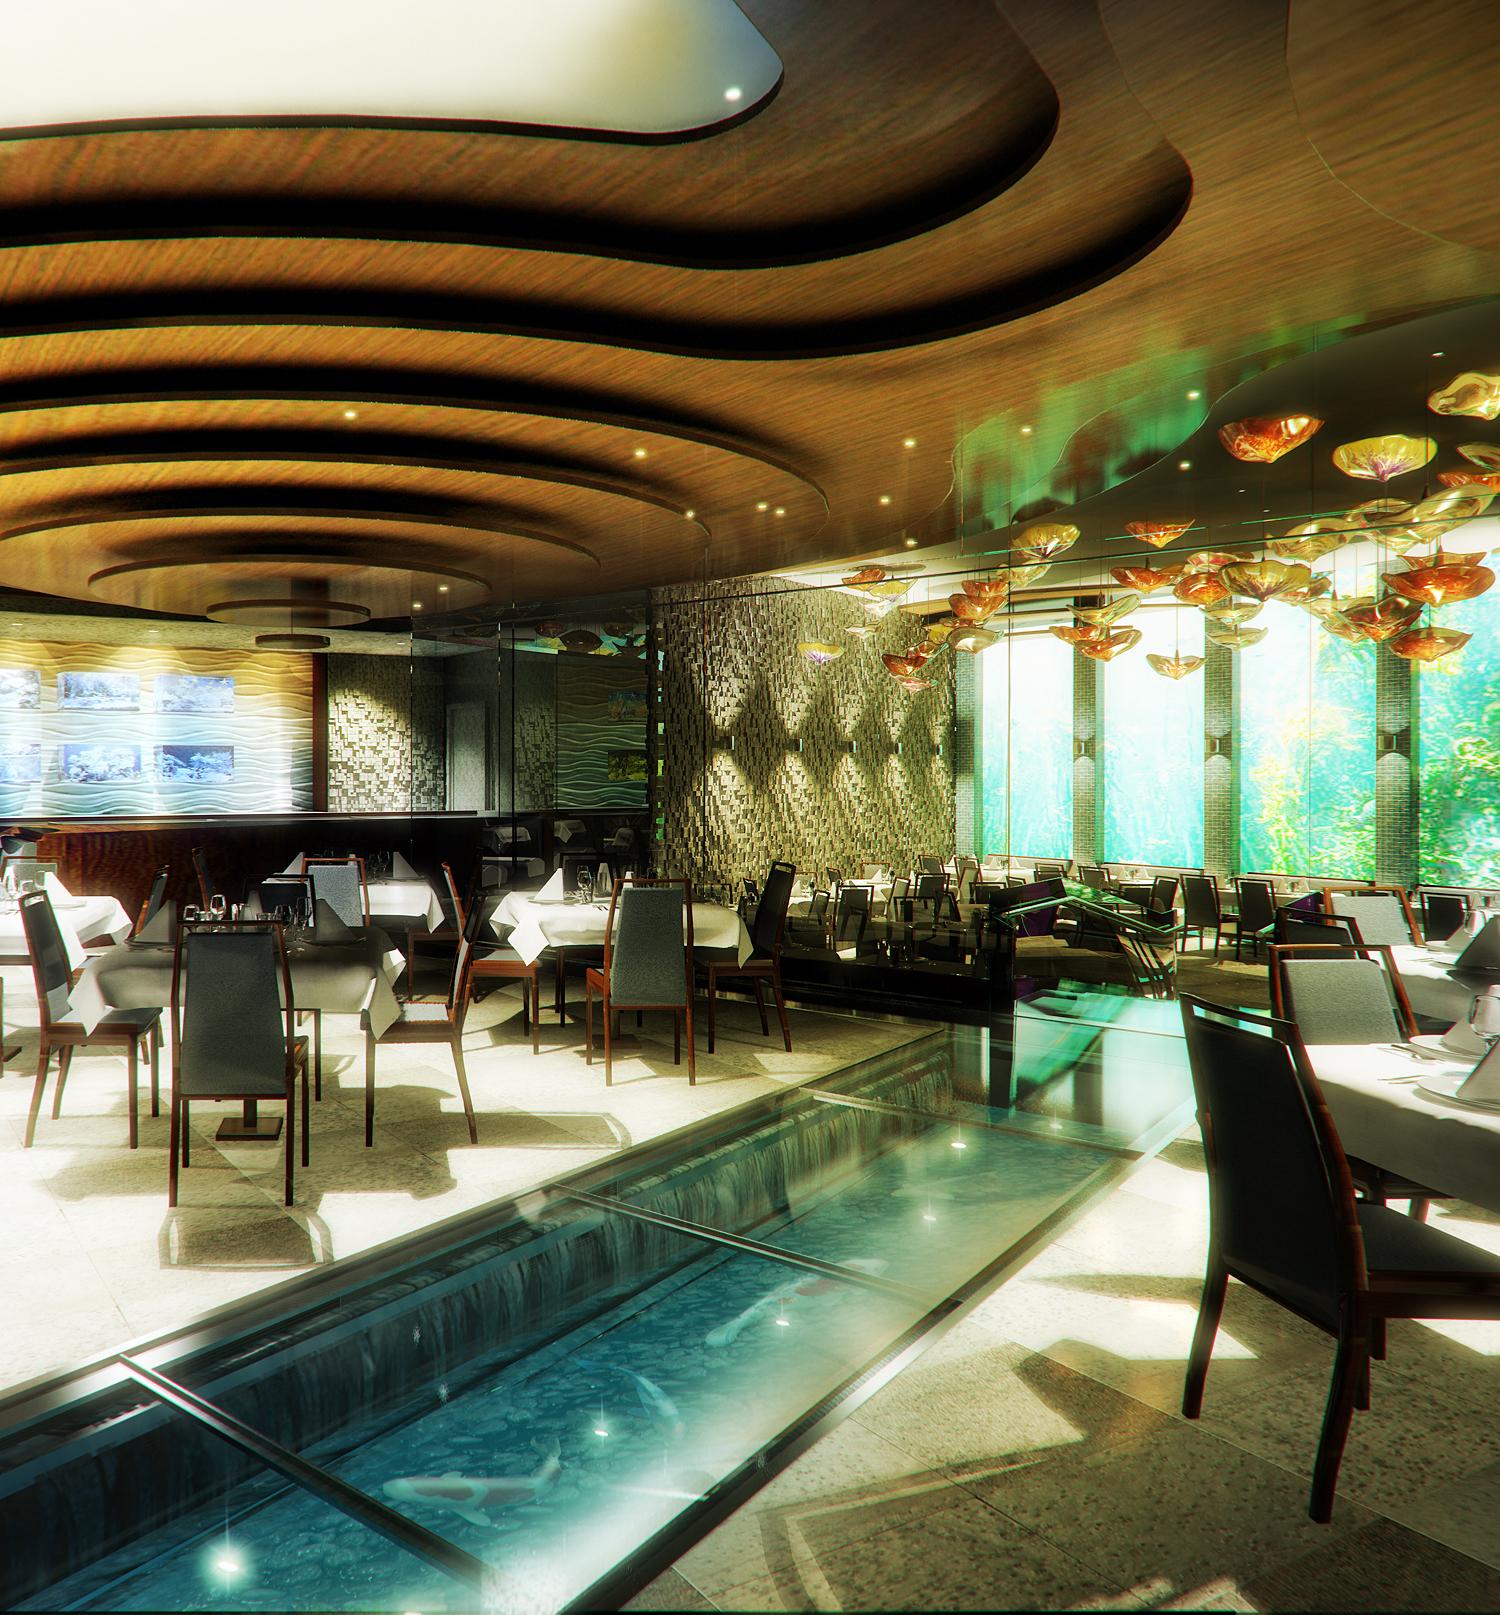 Pin Seafood Restaurant Design On Pinterest